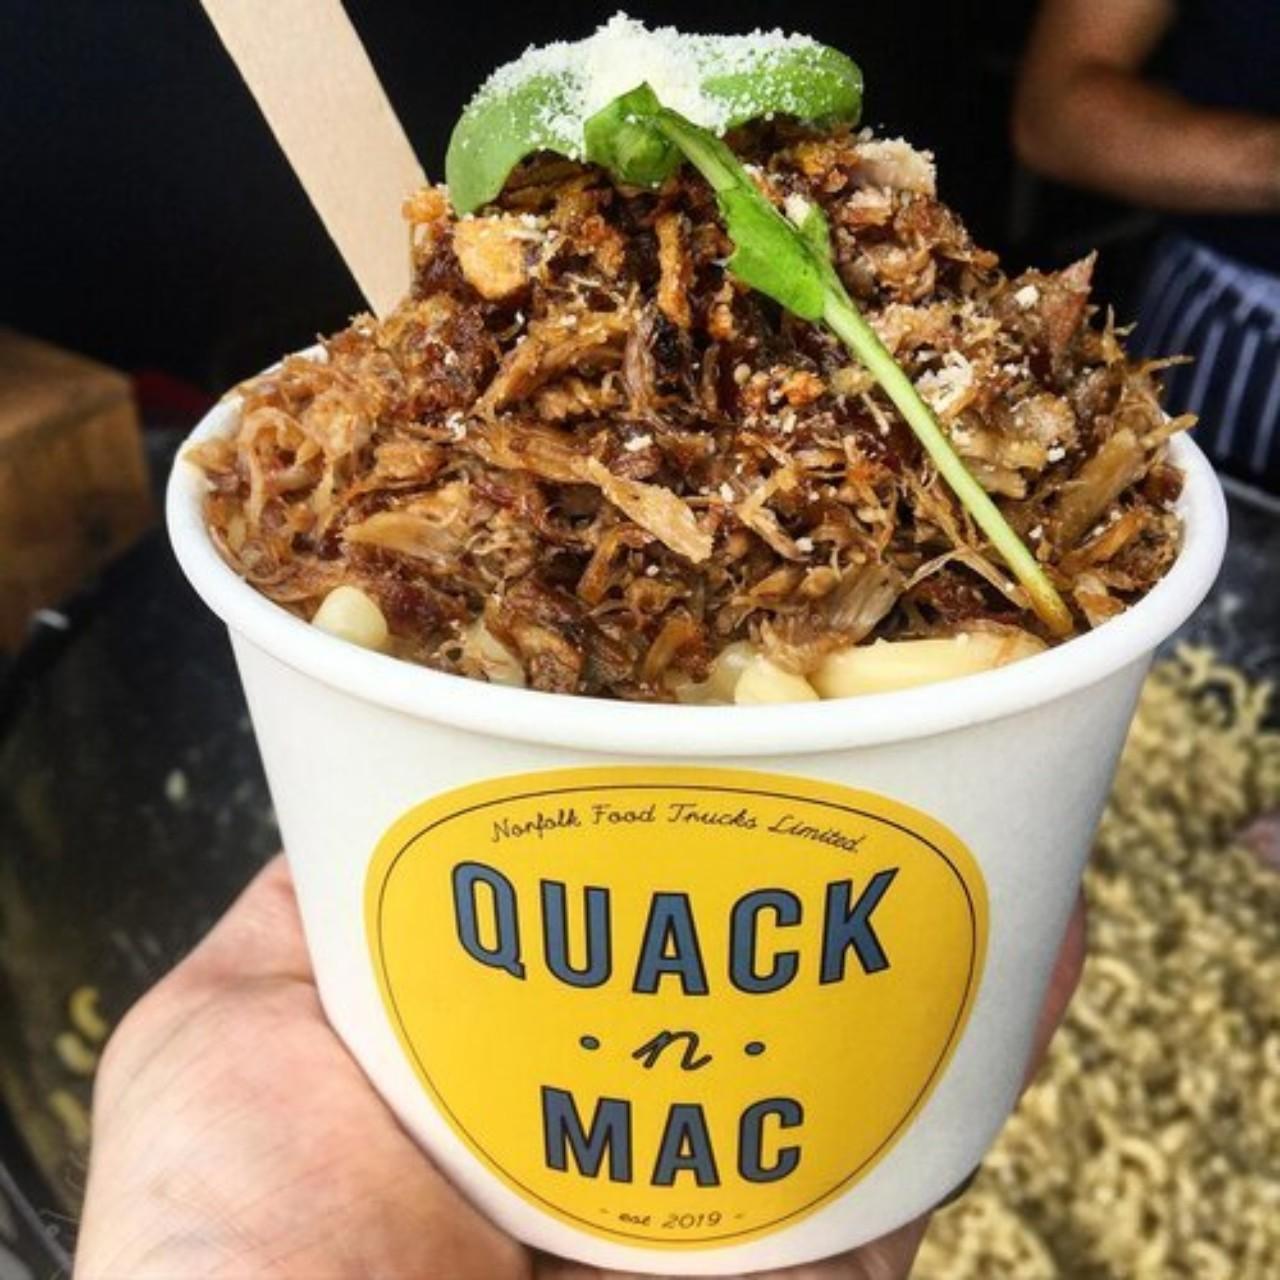 Quacknmac